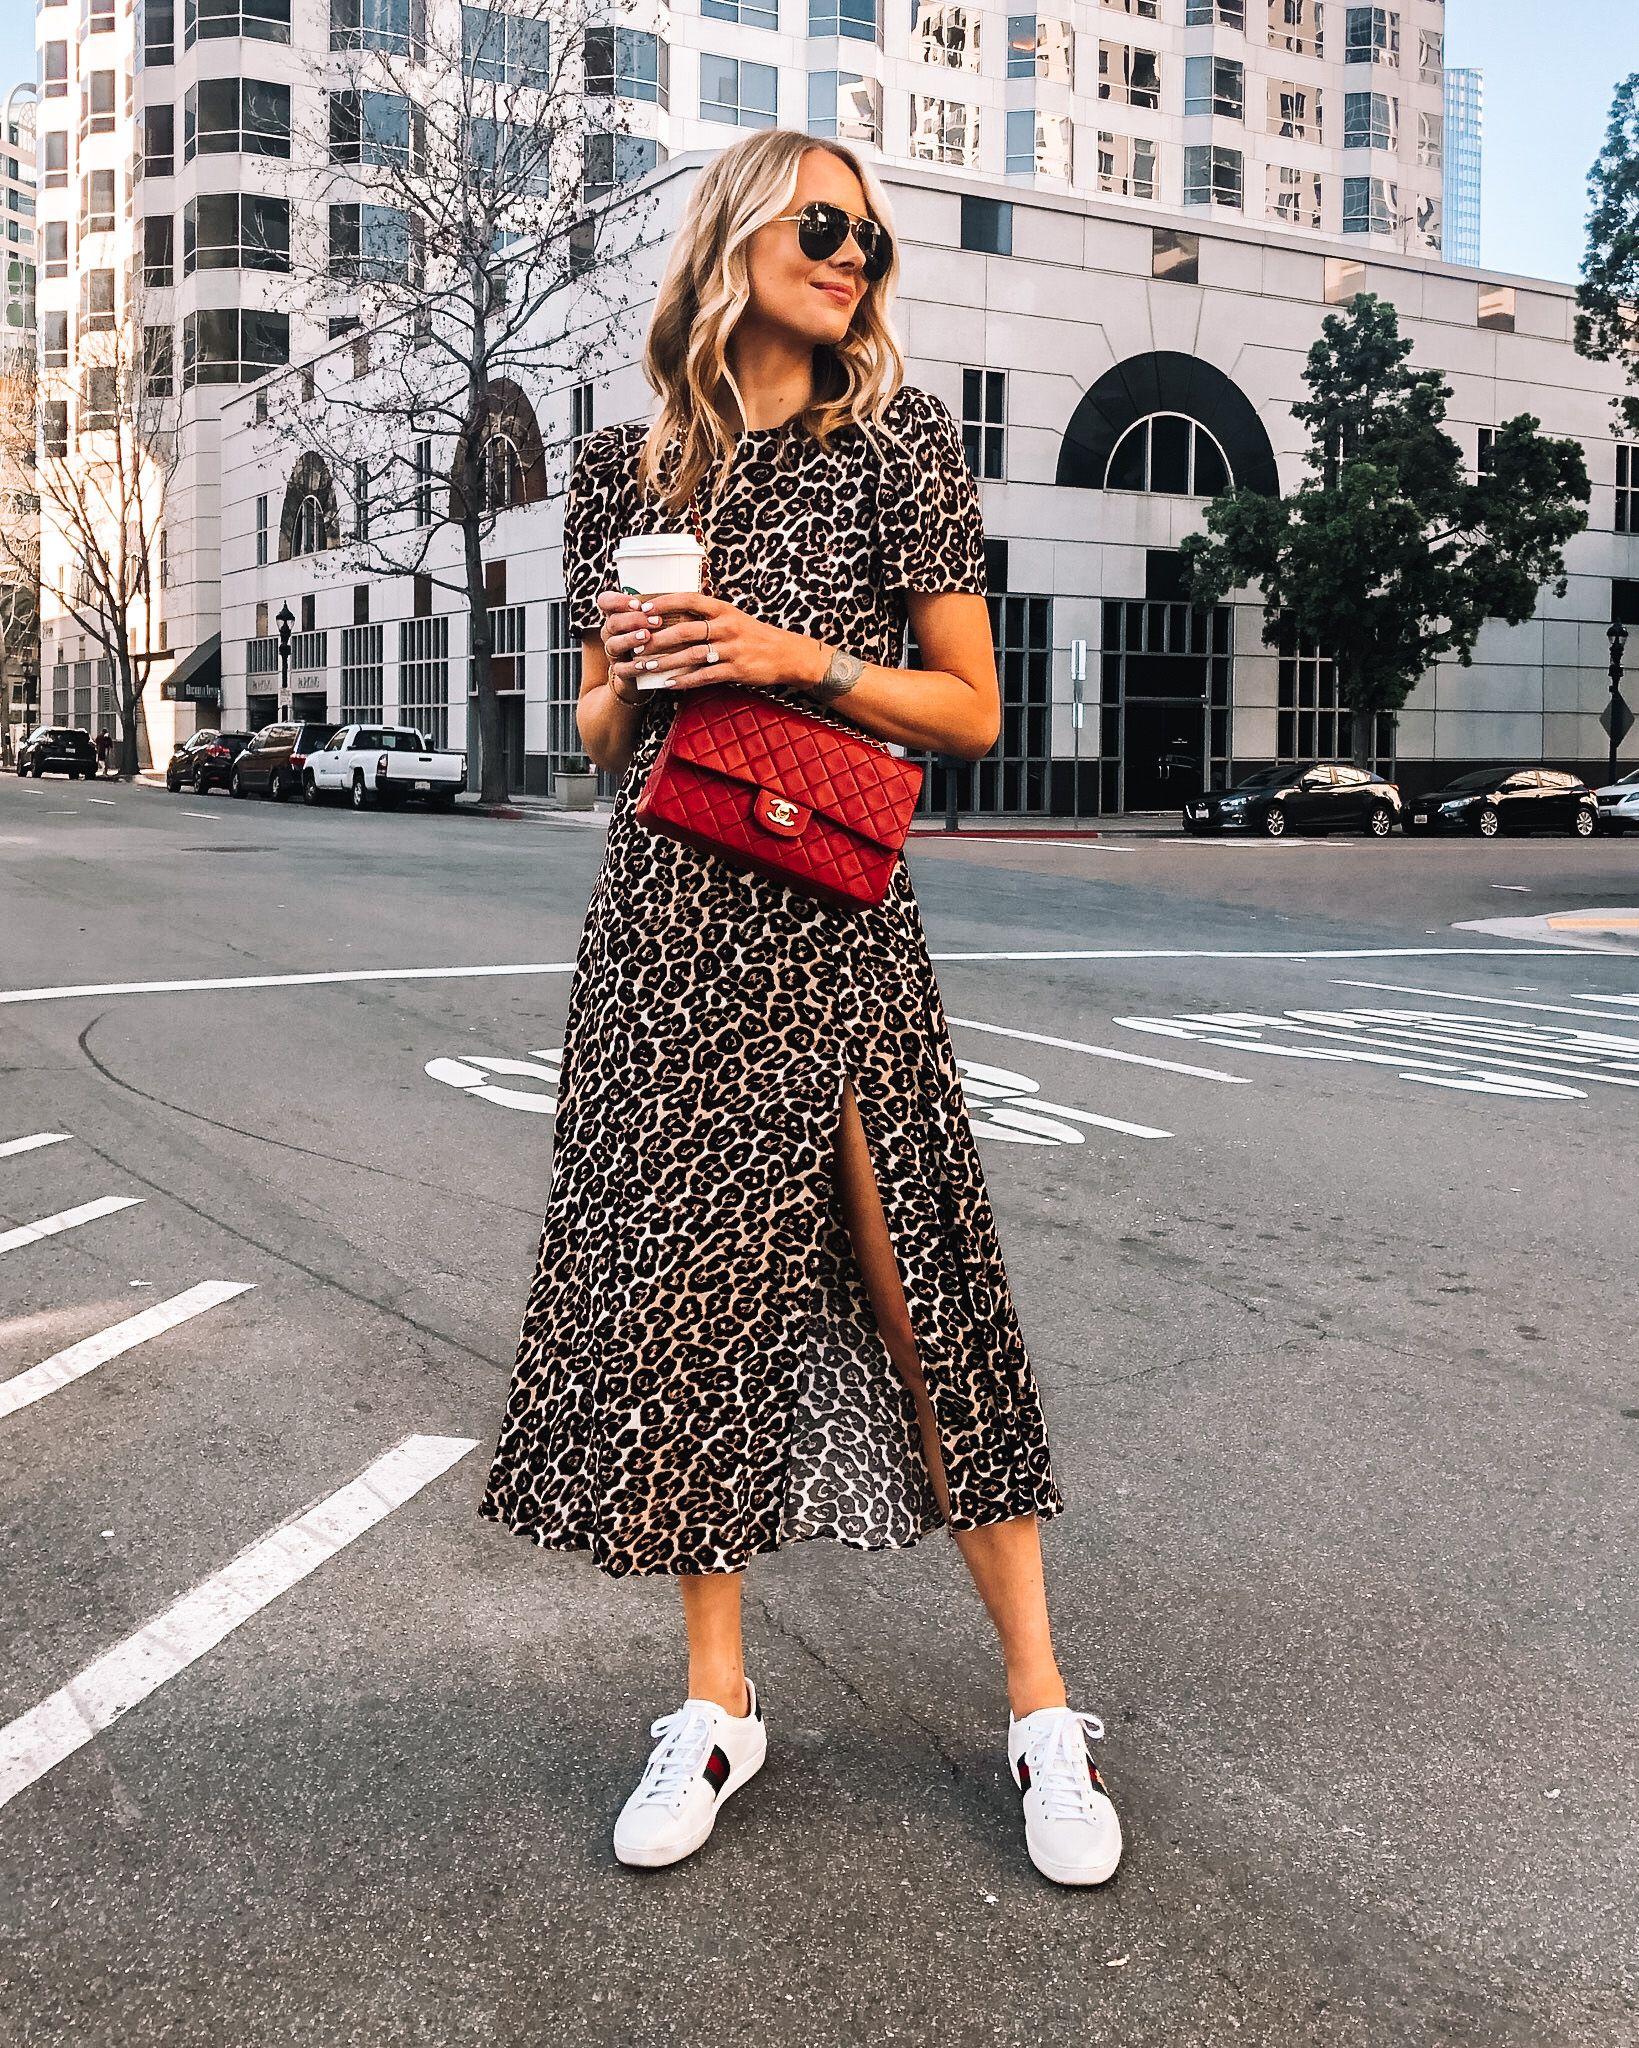 Fashion Jackson Wearing Leopard Midi Dress Red Chanel Handbag Gucci Sneakers Sneaker Outfits Women Fashion Jackson Gucci Sneakers Outfit [ 2048 x 1639 Pixel ]